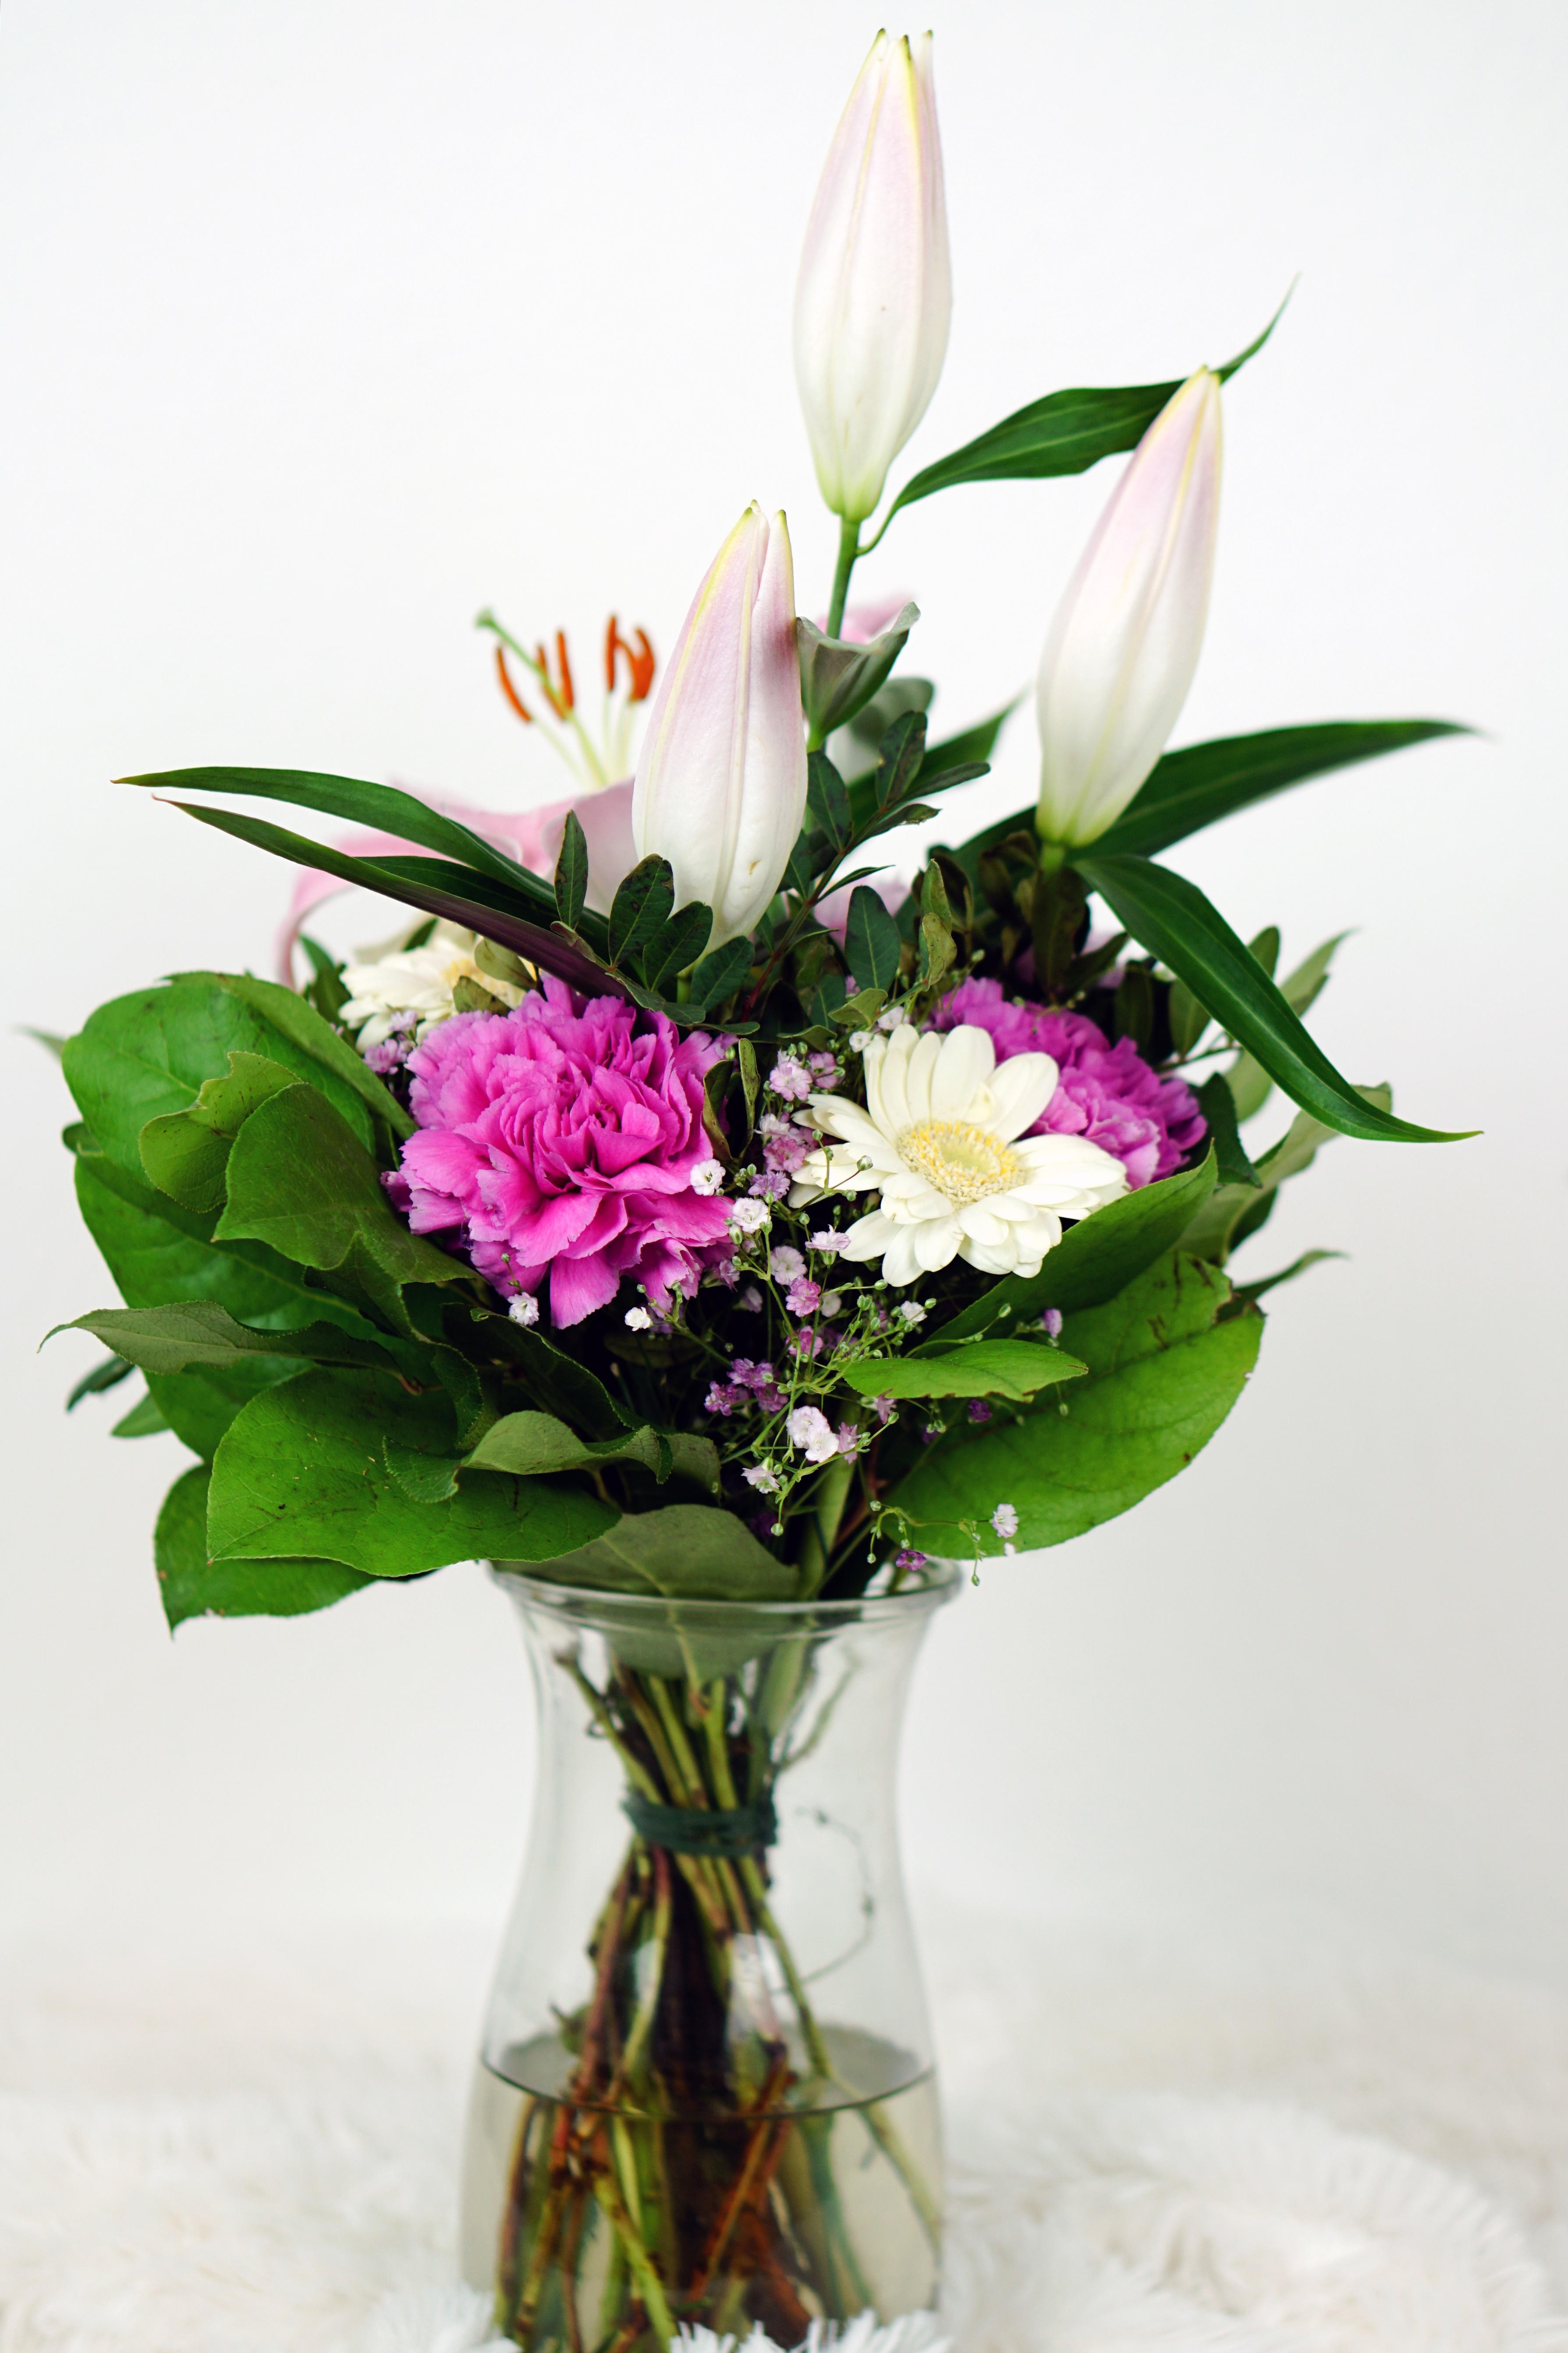 fotos gratis naturaleza florecer celebracion amor regalo decoracin verde vistoso rosado flora da de la boda flores art festival alegra